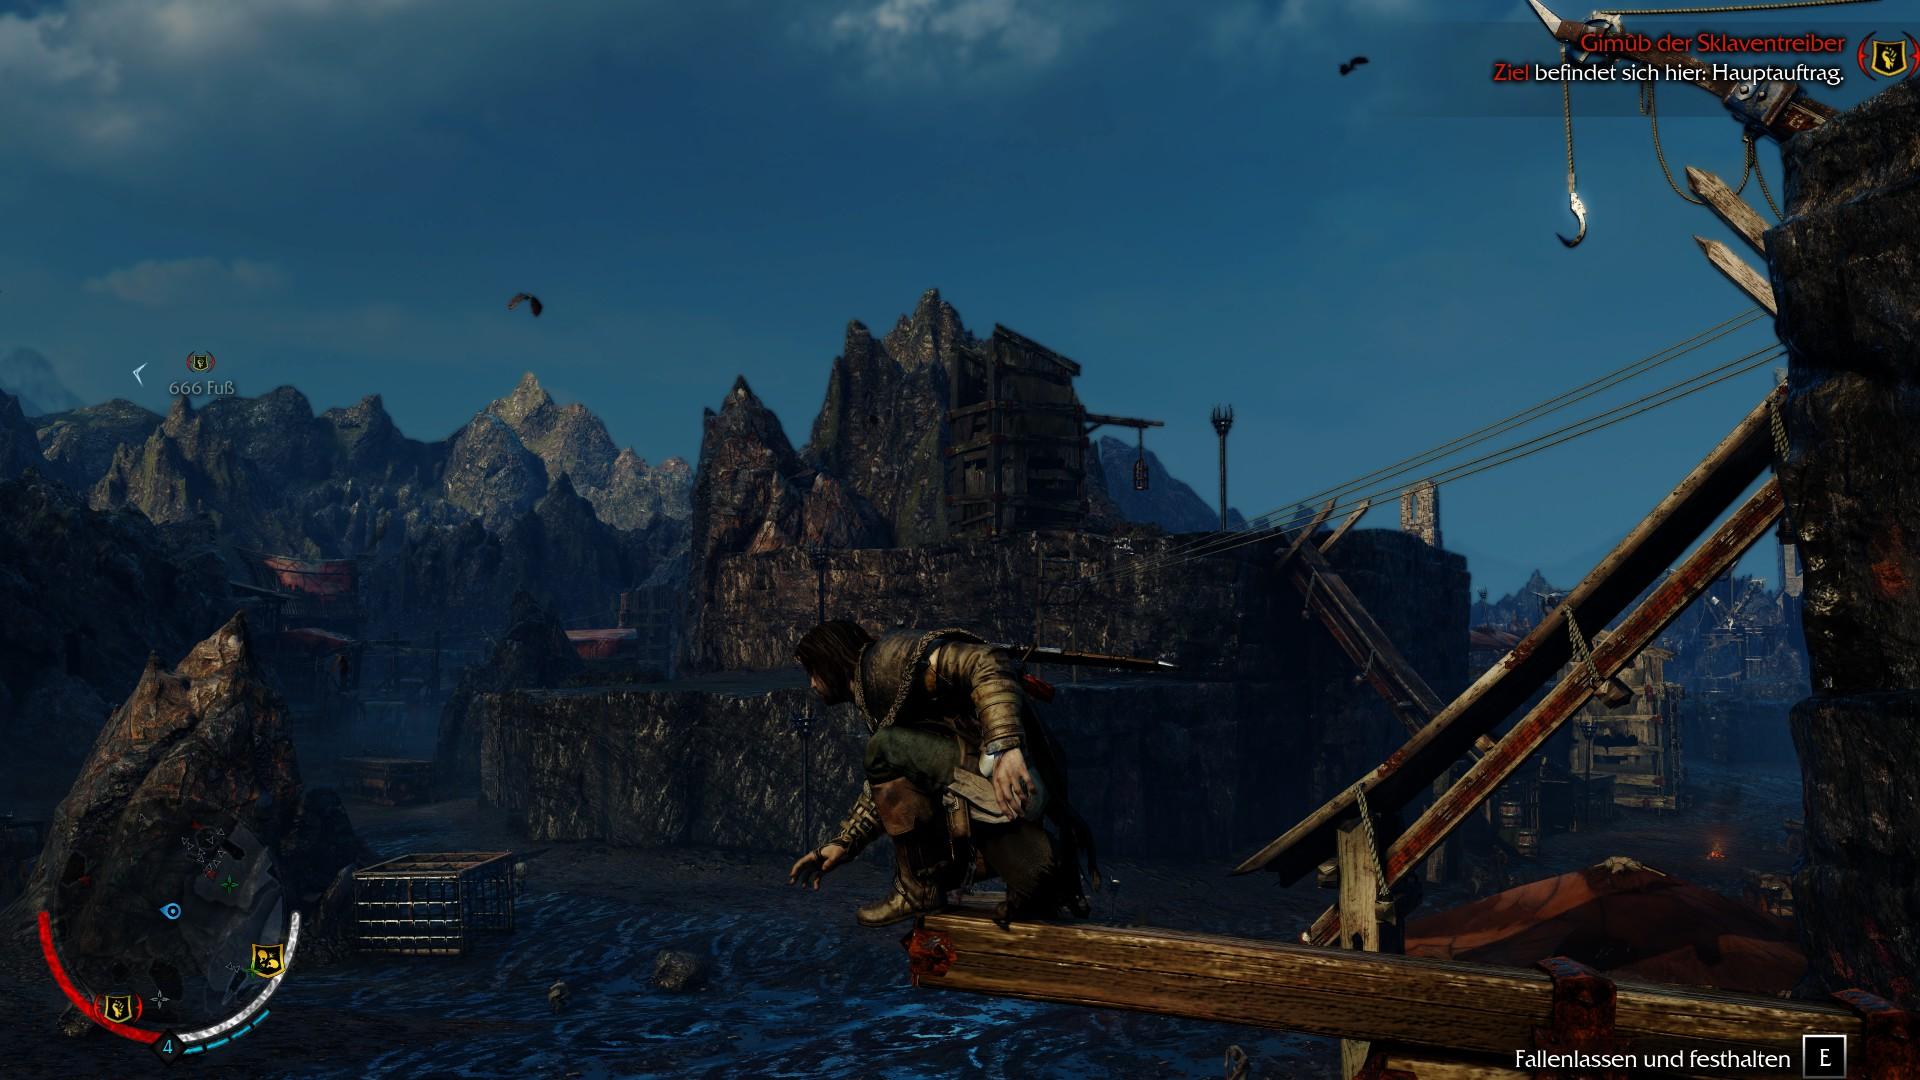 Mittelerde Mordors Schatten - Klettern wie in Assassins Creed